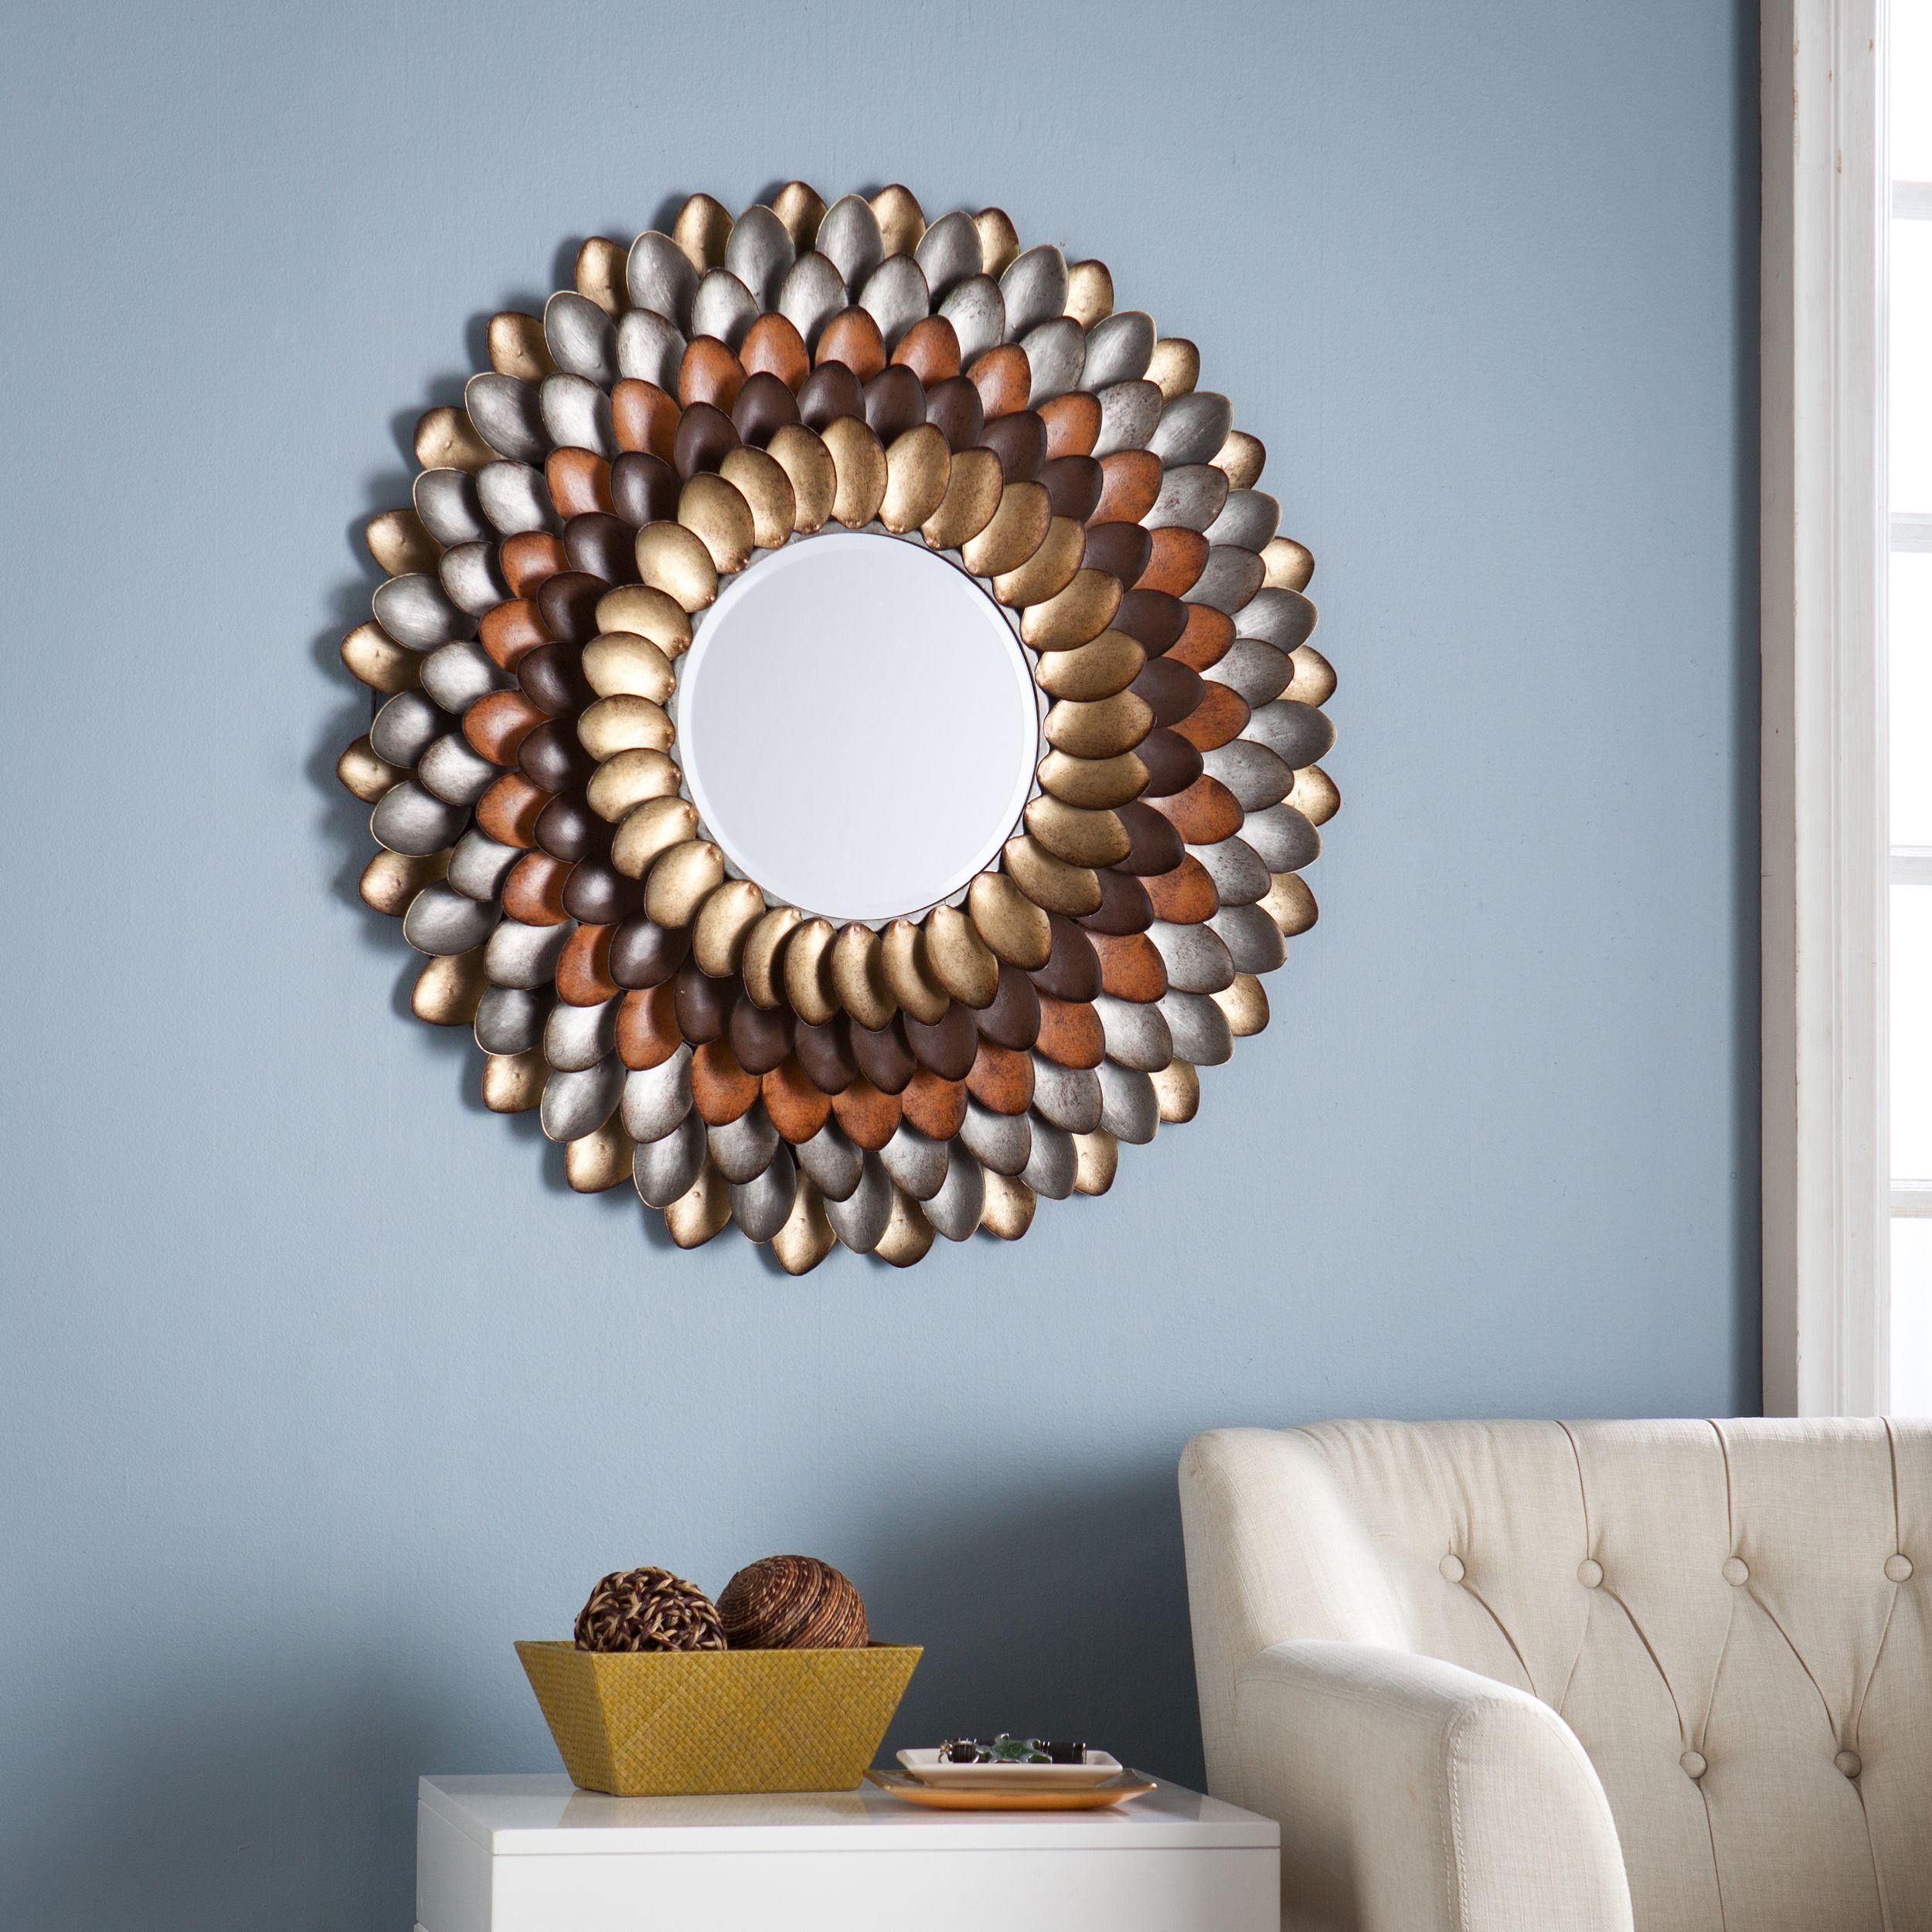 online mirrors designer decorative eclisse fd india sp decor mirror wall buy designers